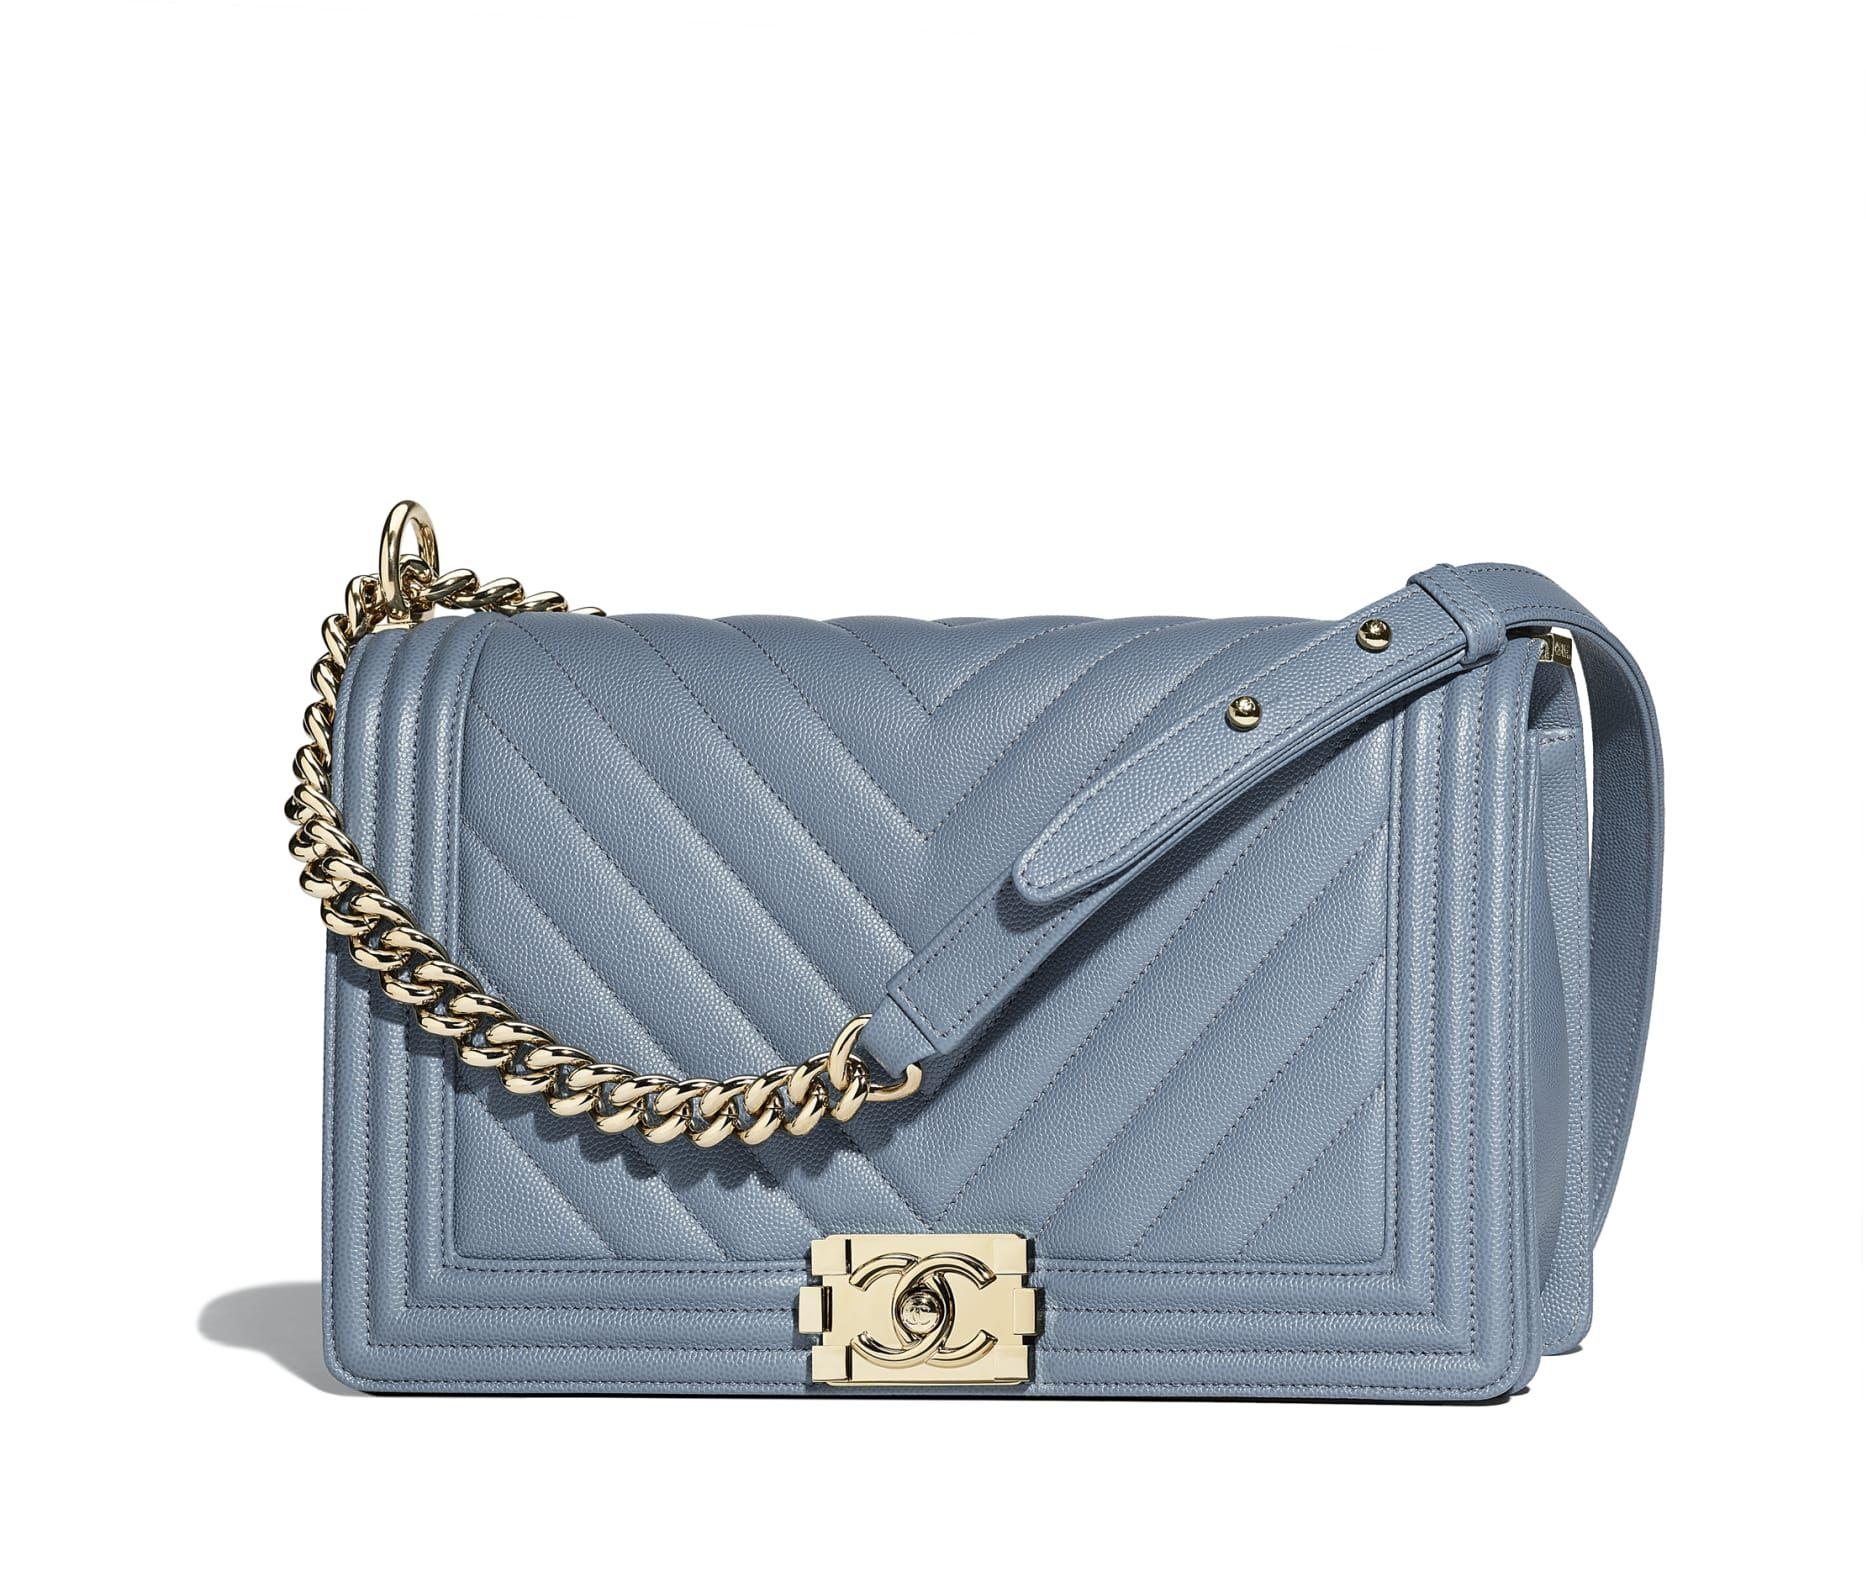 ae16125ceb782b Large BOY CHANEL Handbag, grained calfskin & gold-tone metal, blue - CHANEL  Large BOY CHANEL Handbag Grained calfskin & gold-tone metal Blue 17.5 × 28  × 7.5 ...